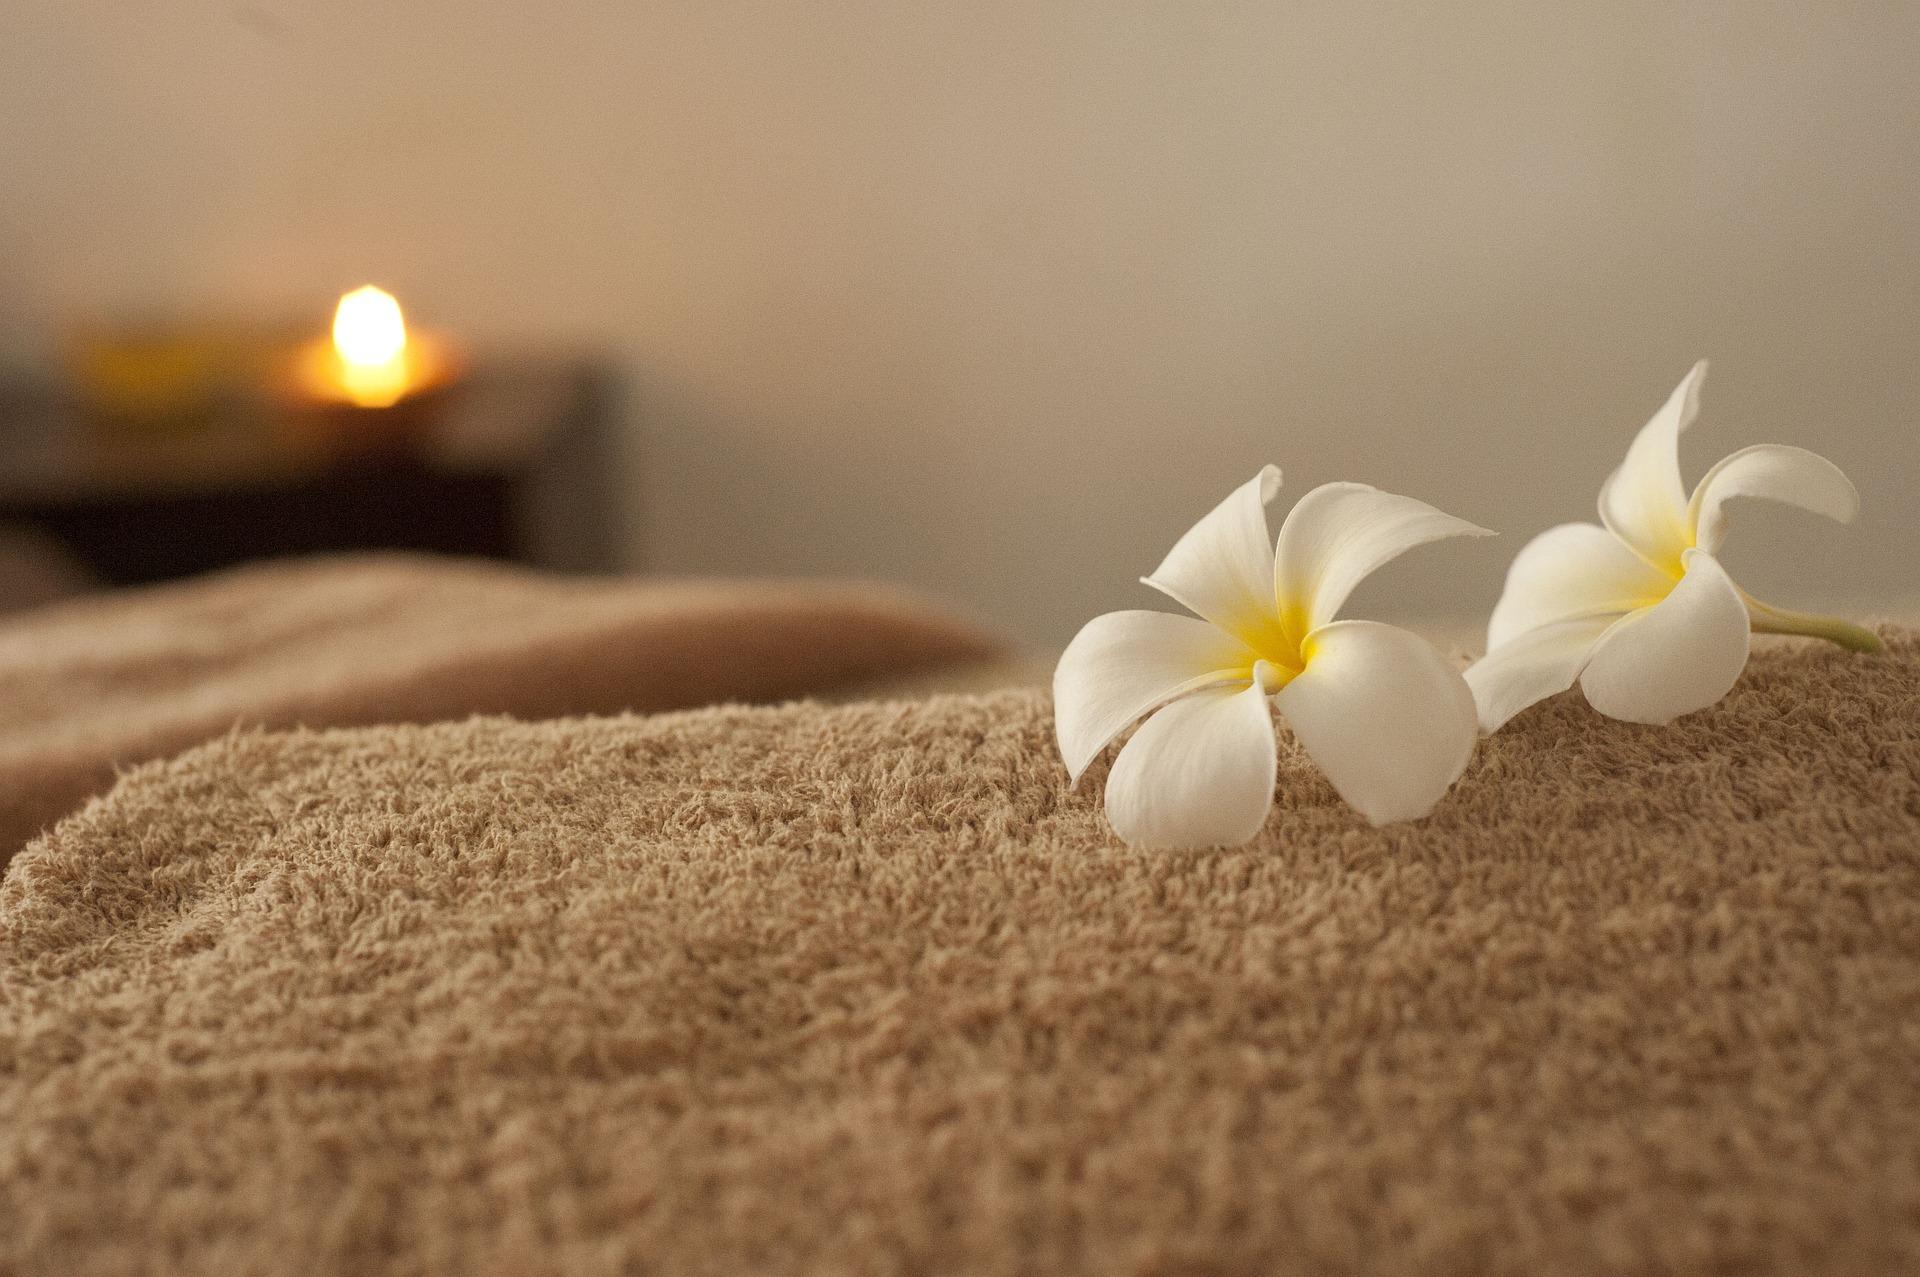 relaxation-686392_1920.jpg